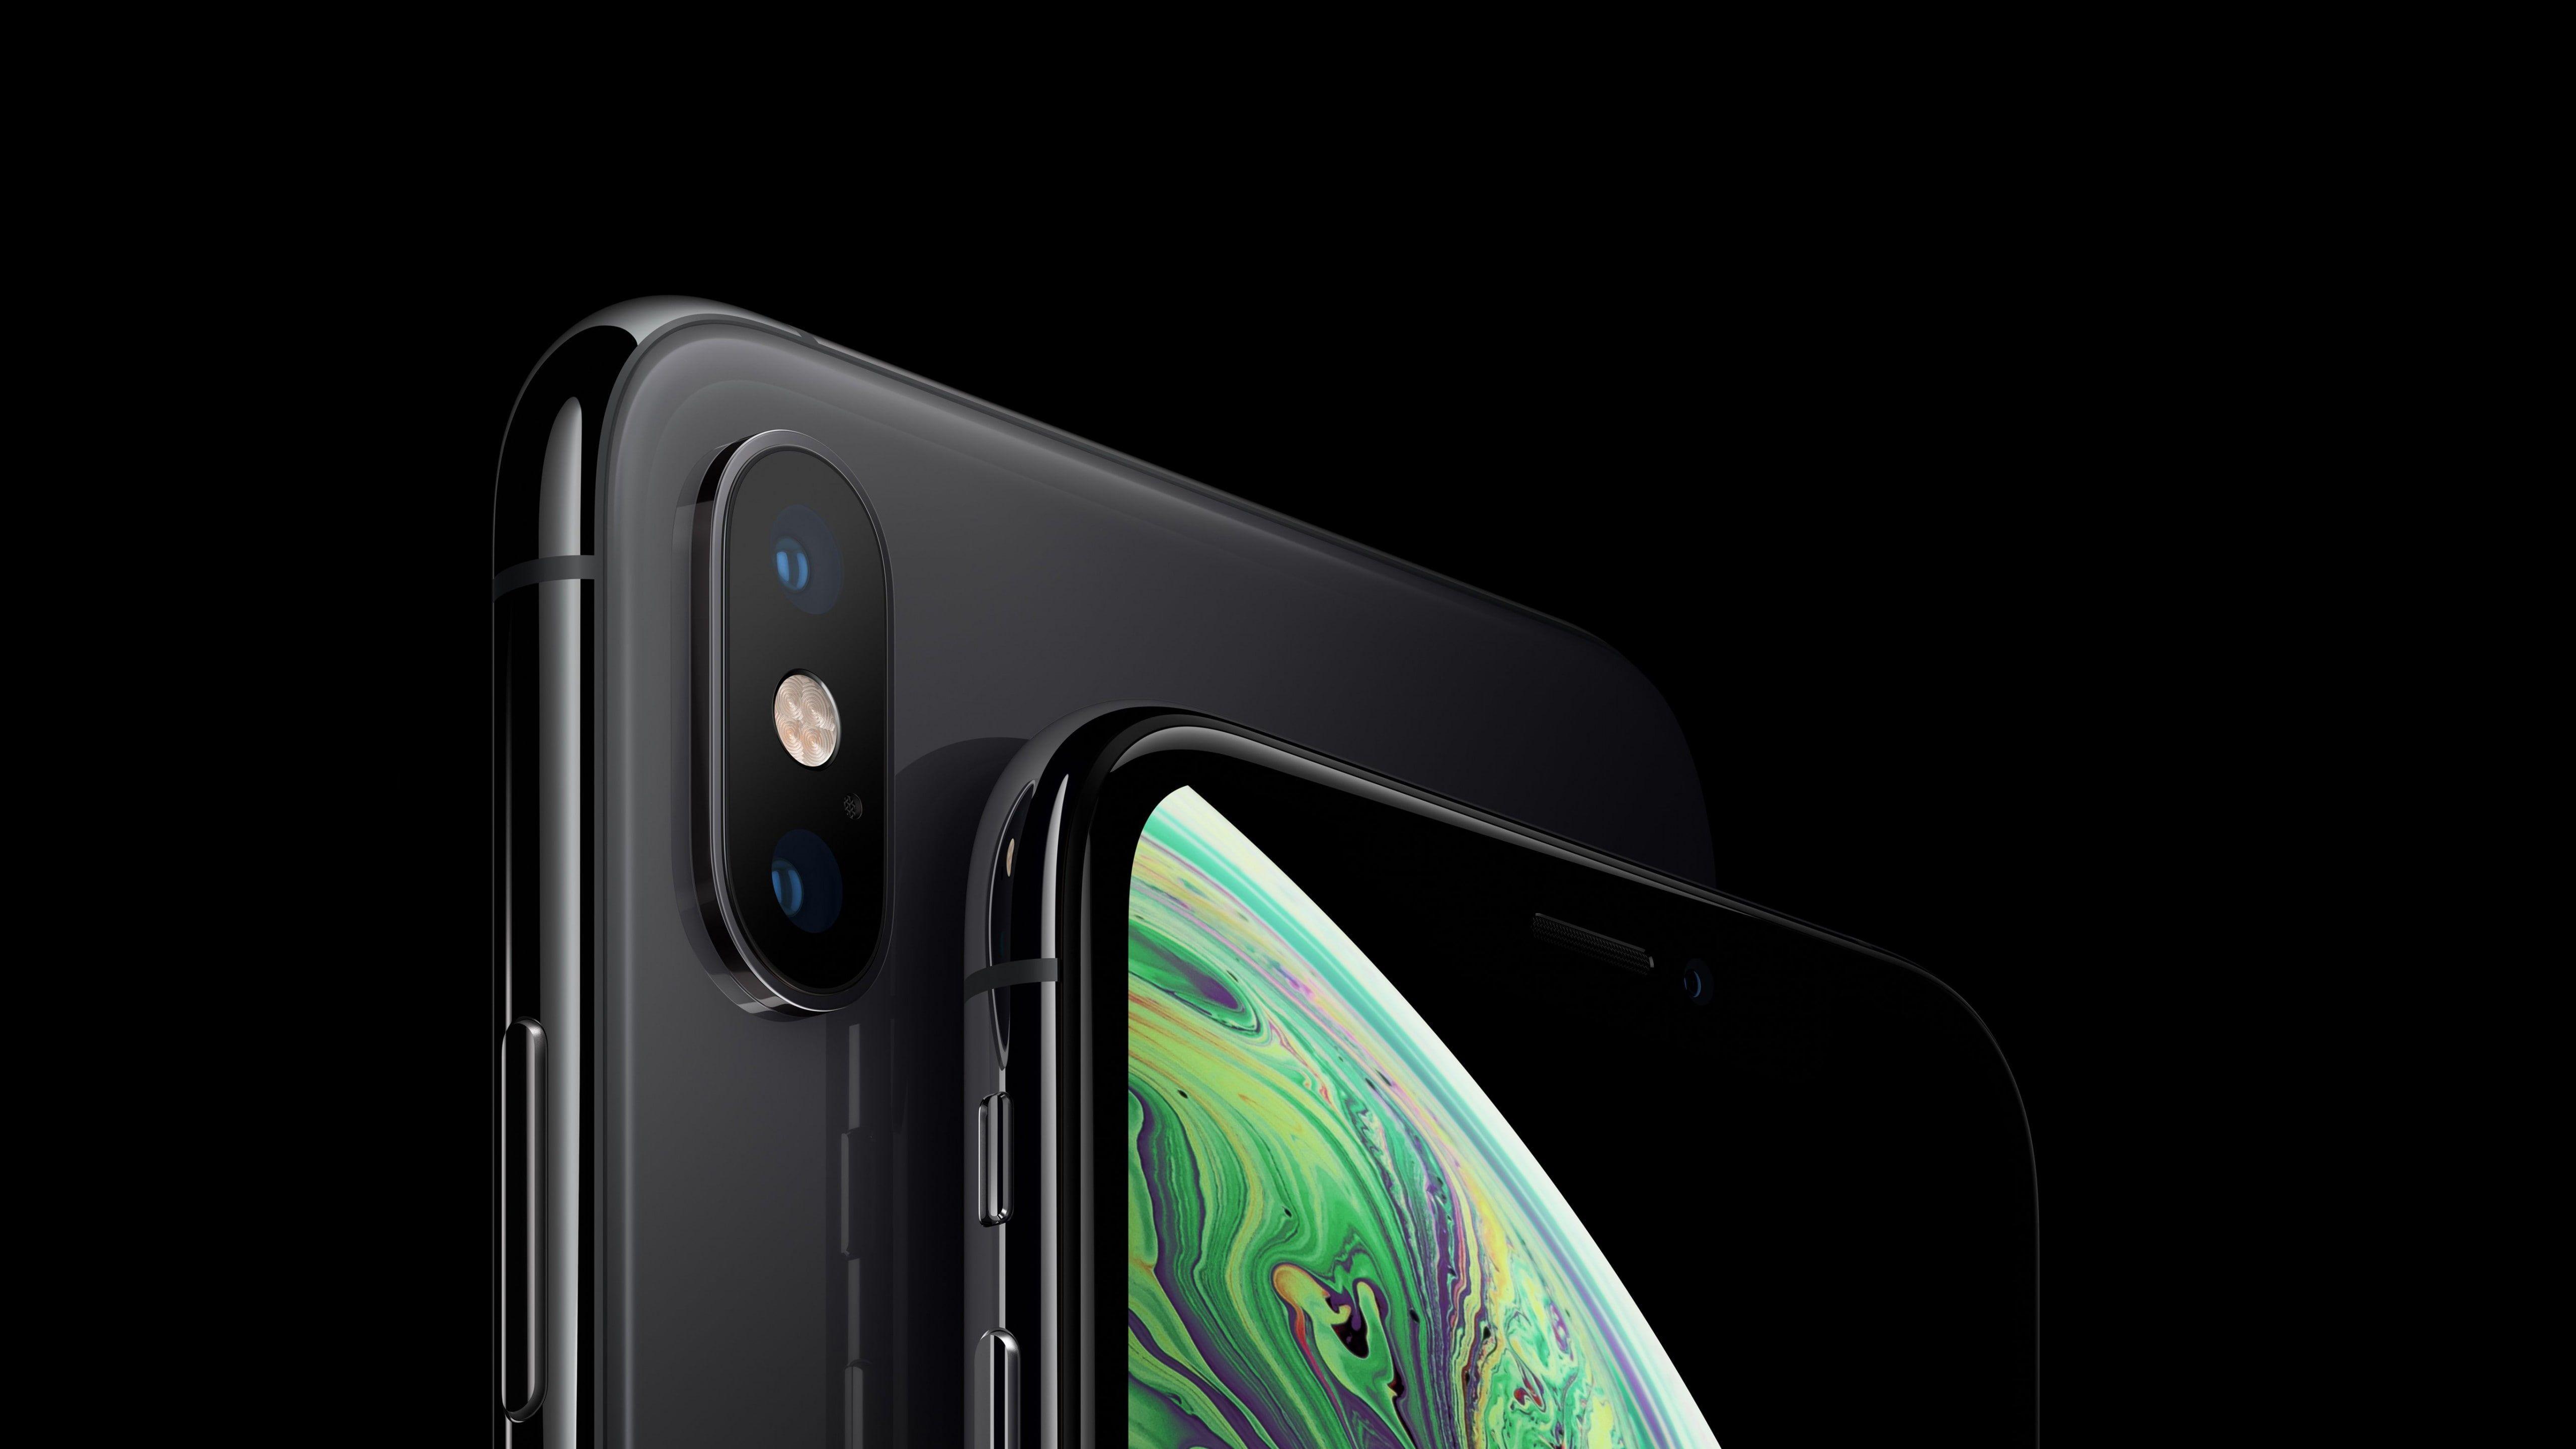 Iphone Xs Iphone Xs Max Space Gray Smartphone 5k Apple September 2018 Event 5k Wallpaper Hdwallpaper Deskt Apple Iphone Iphone Xs Max Iphone 6s Rose Gold